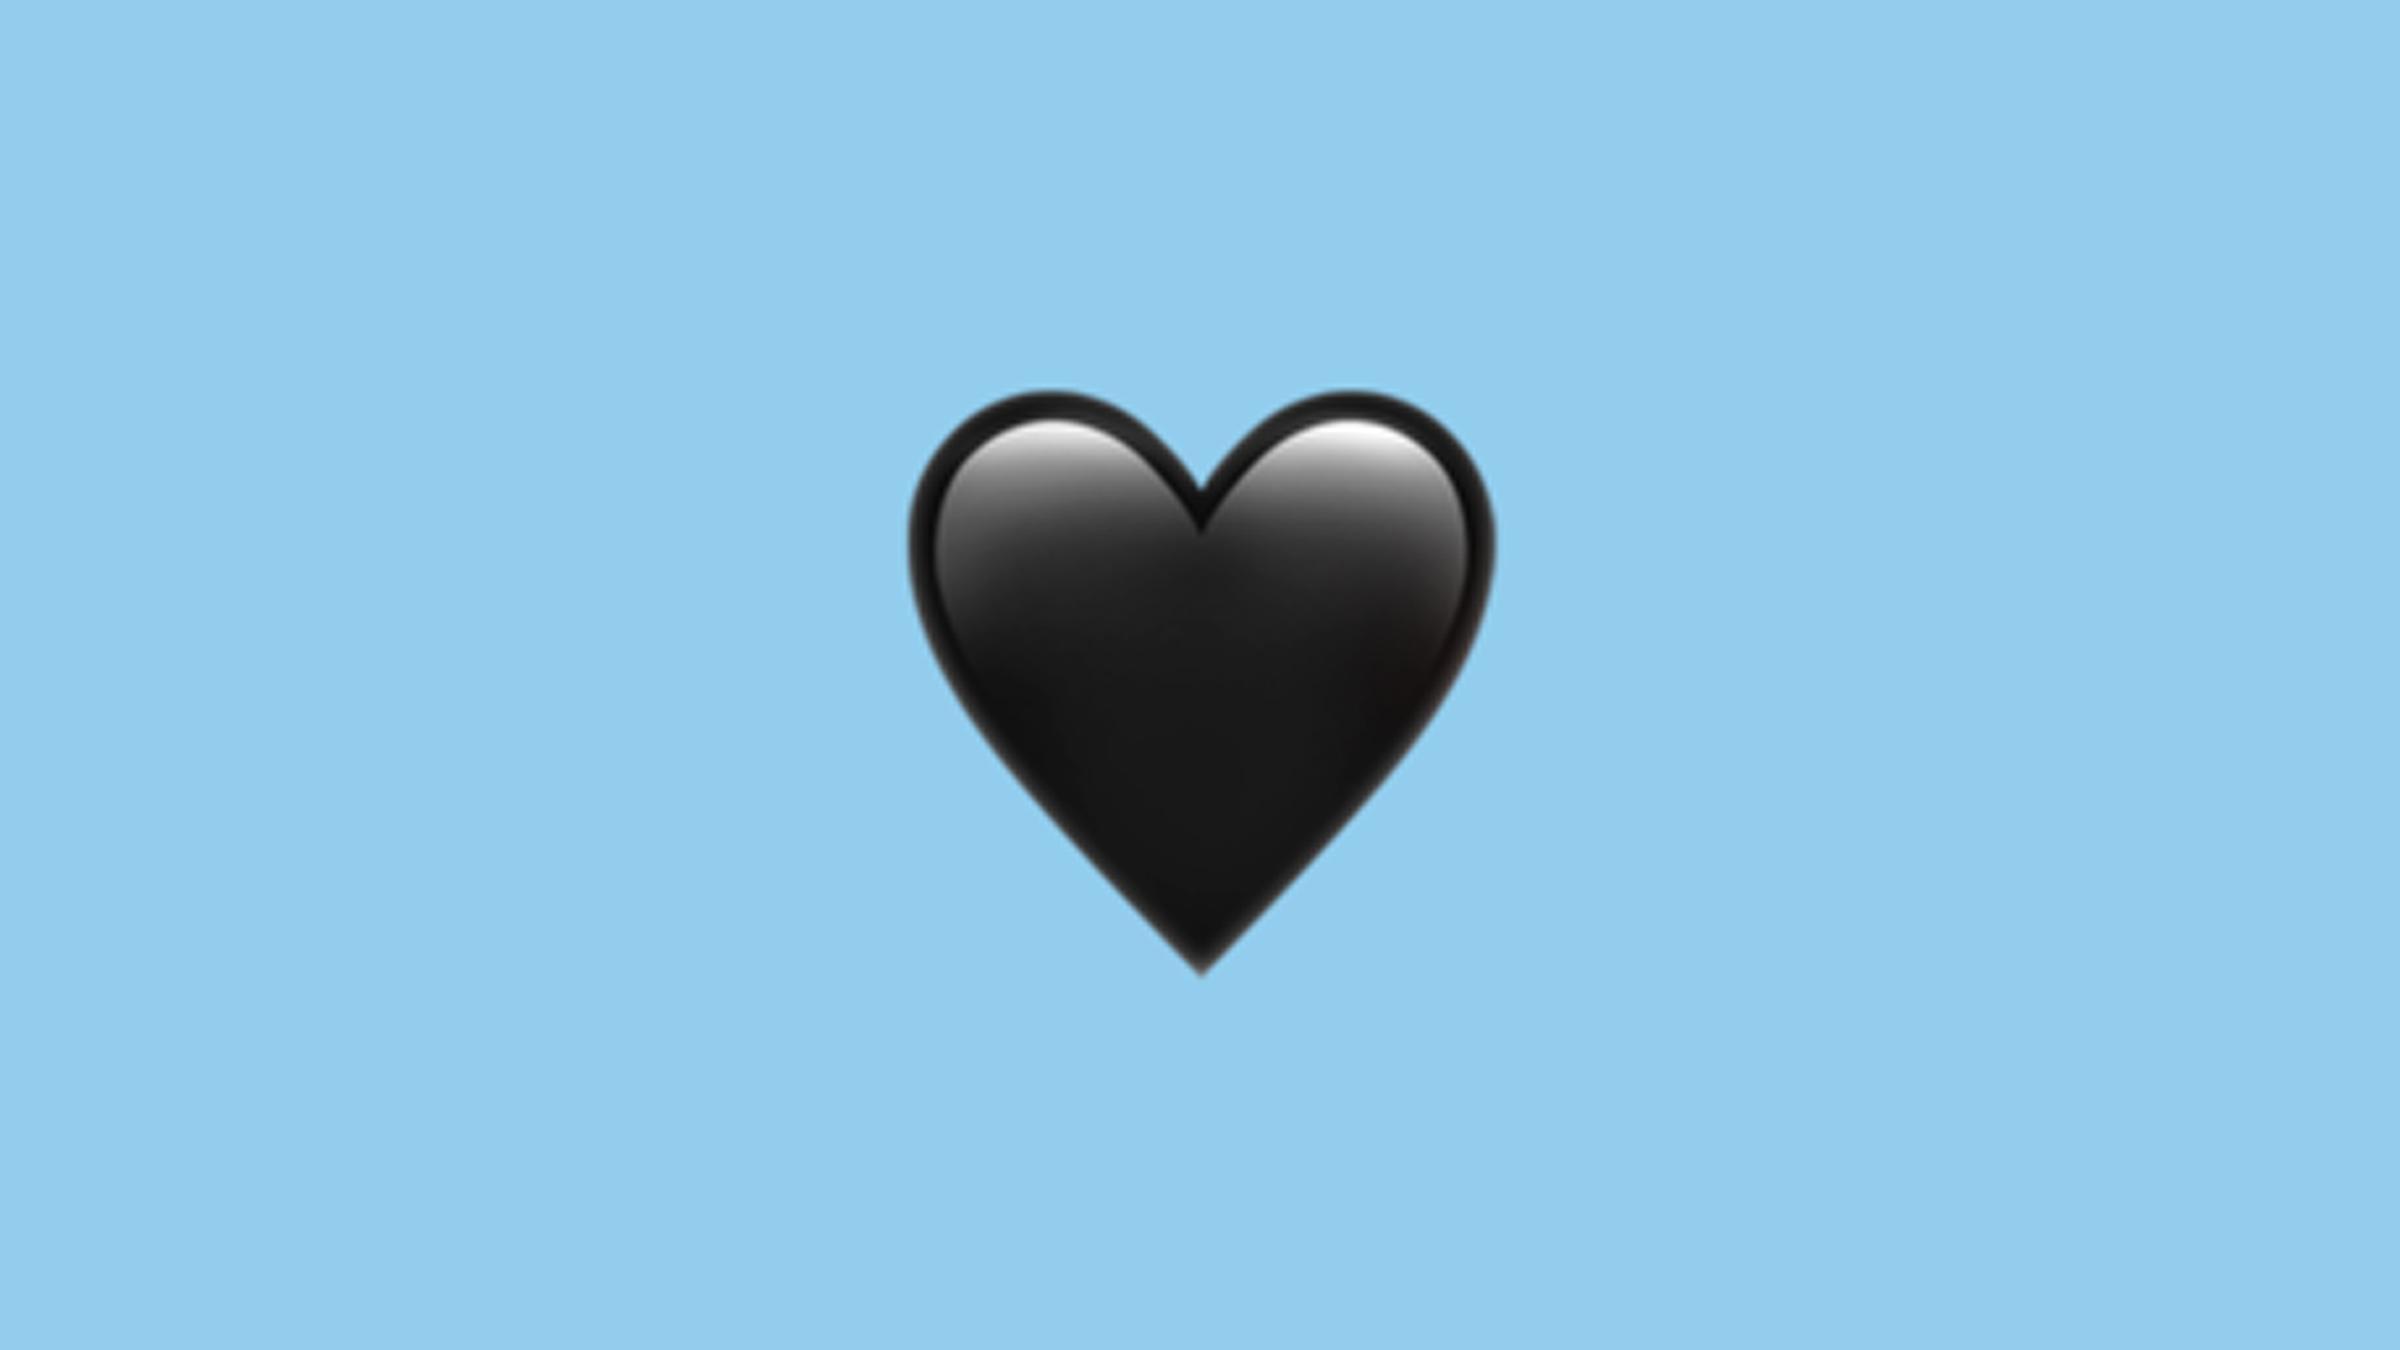 Schwarzes Herz Zum Kopieren - Ivisha Gerom